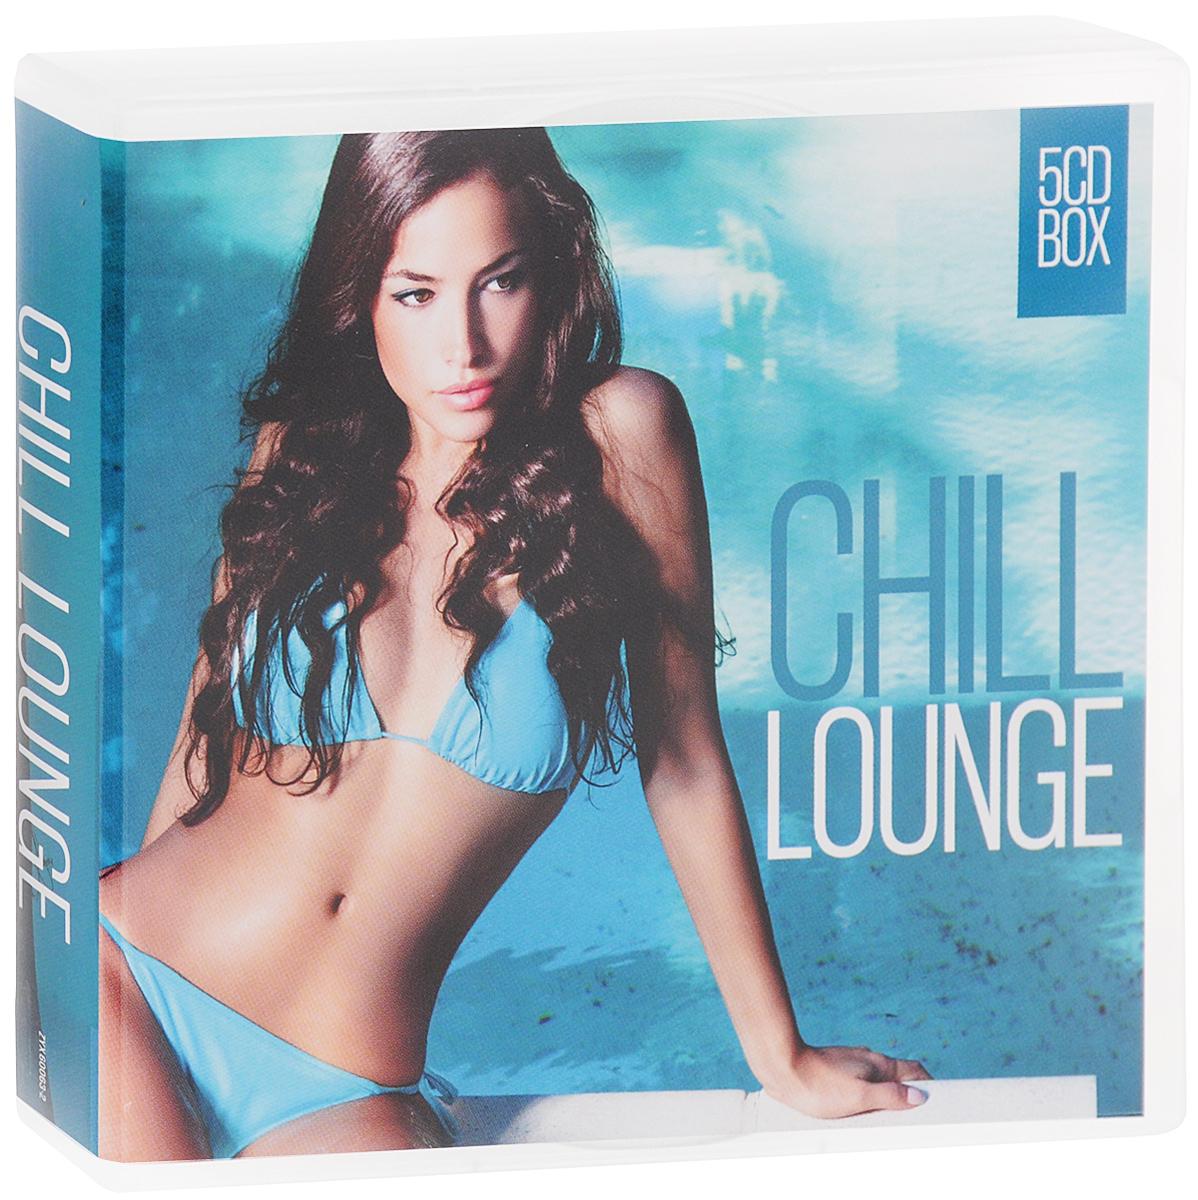 Chill Lounge (5 CD)